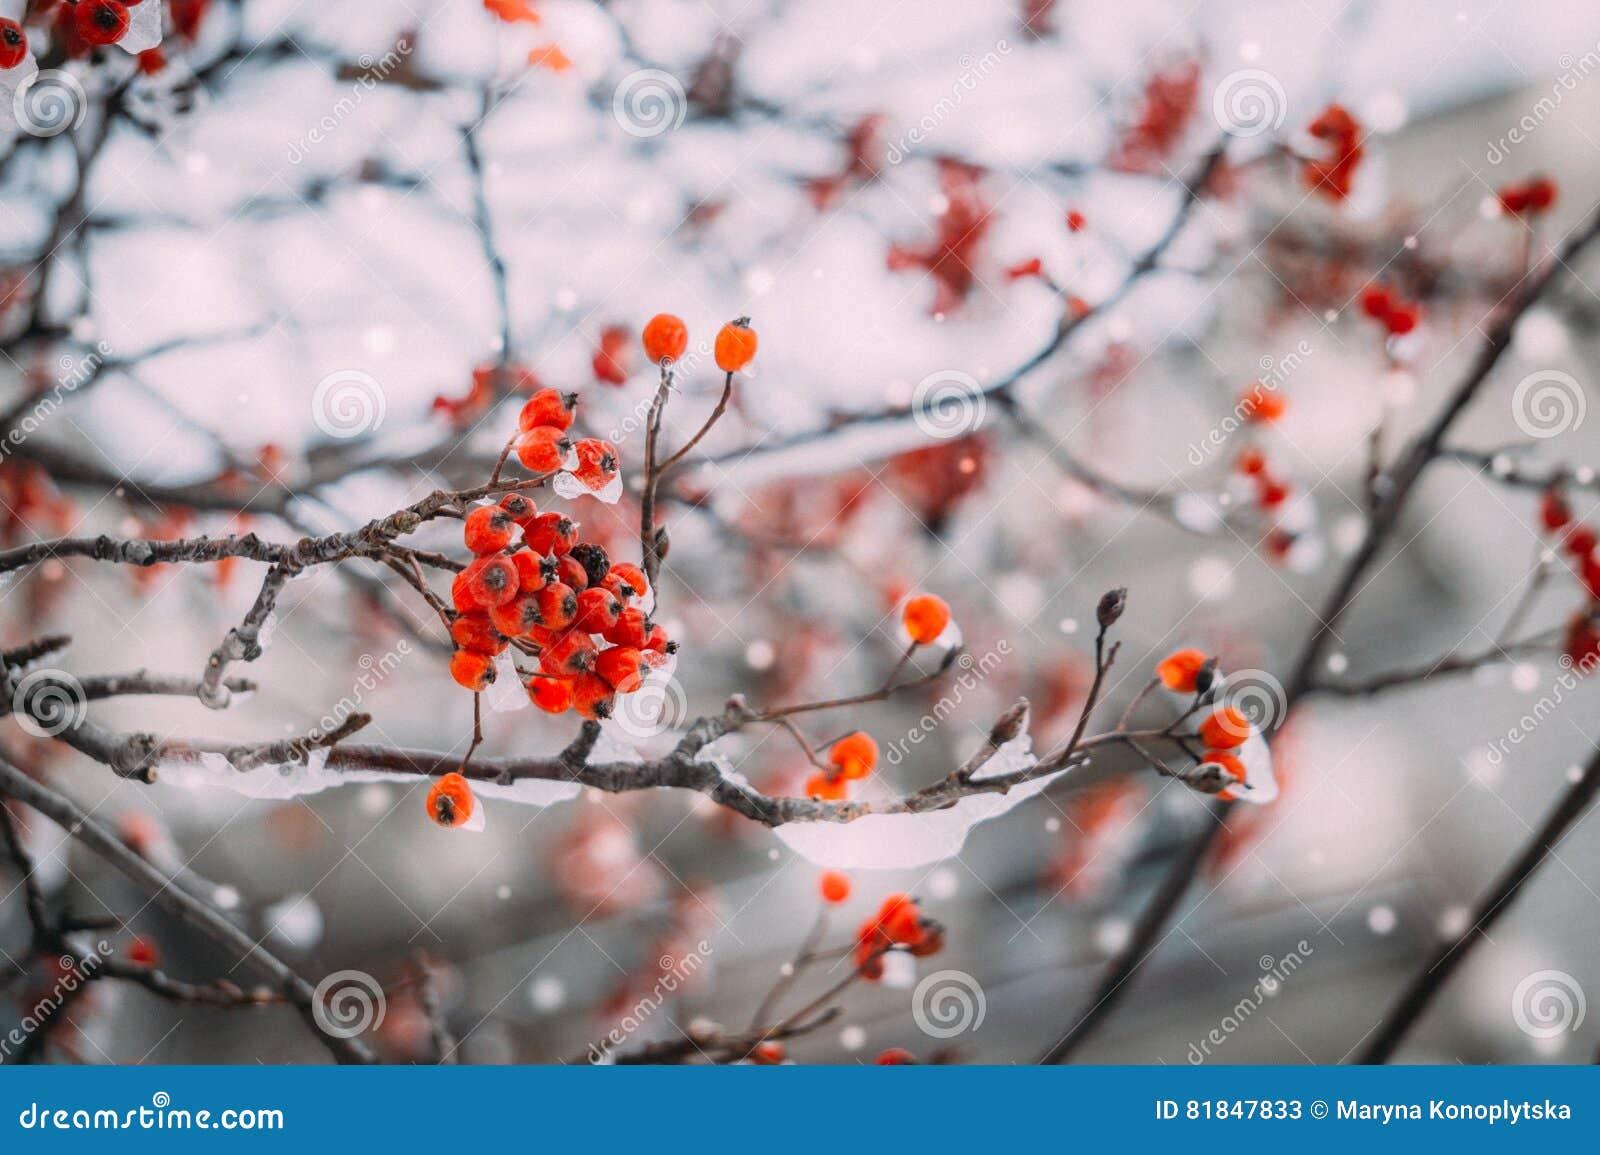 Rowan berries under the snow